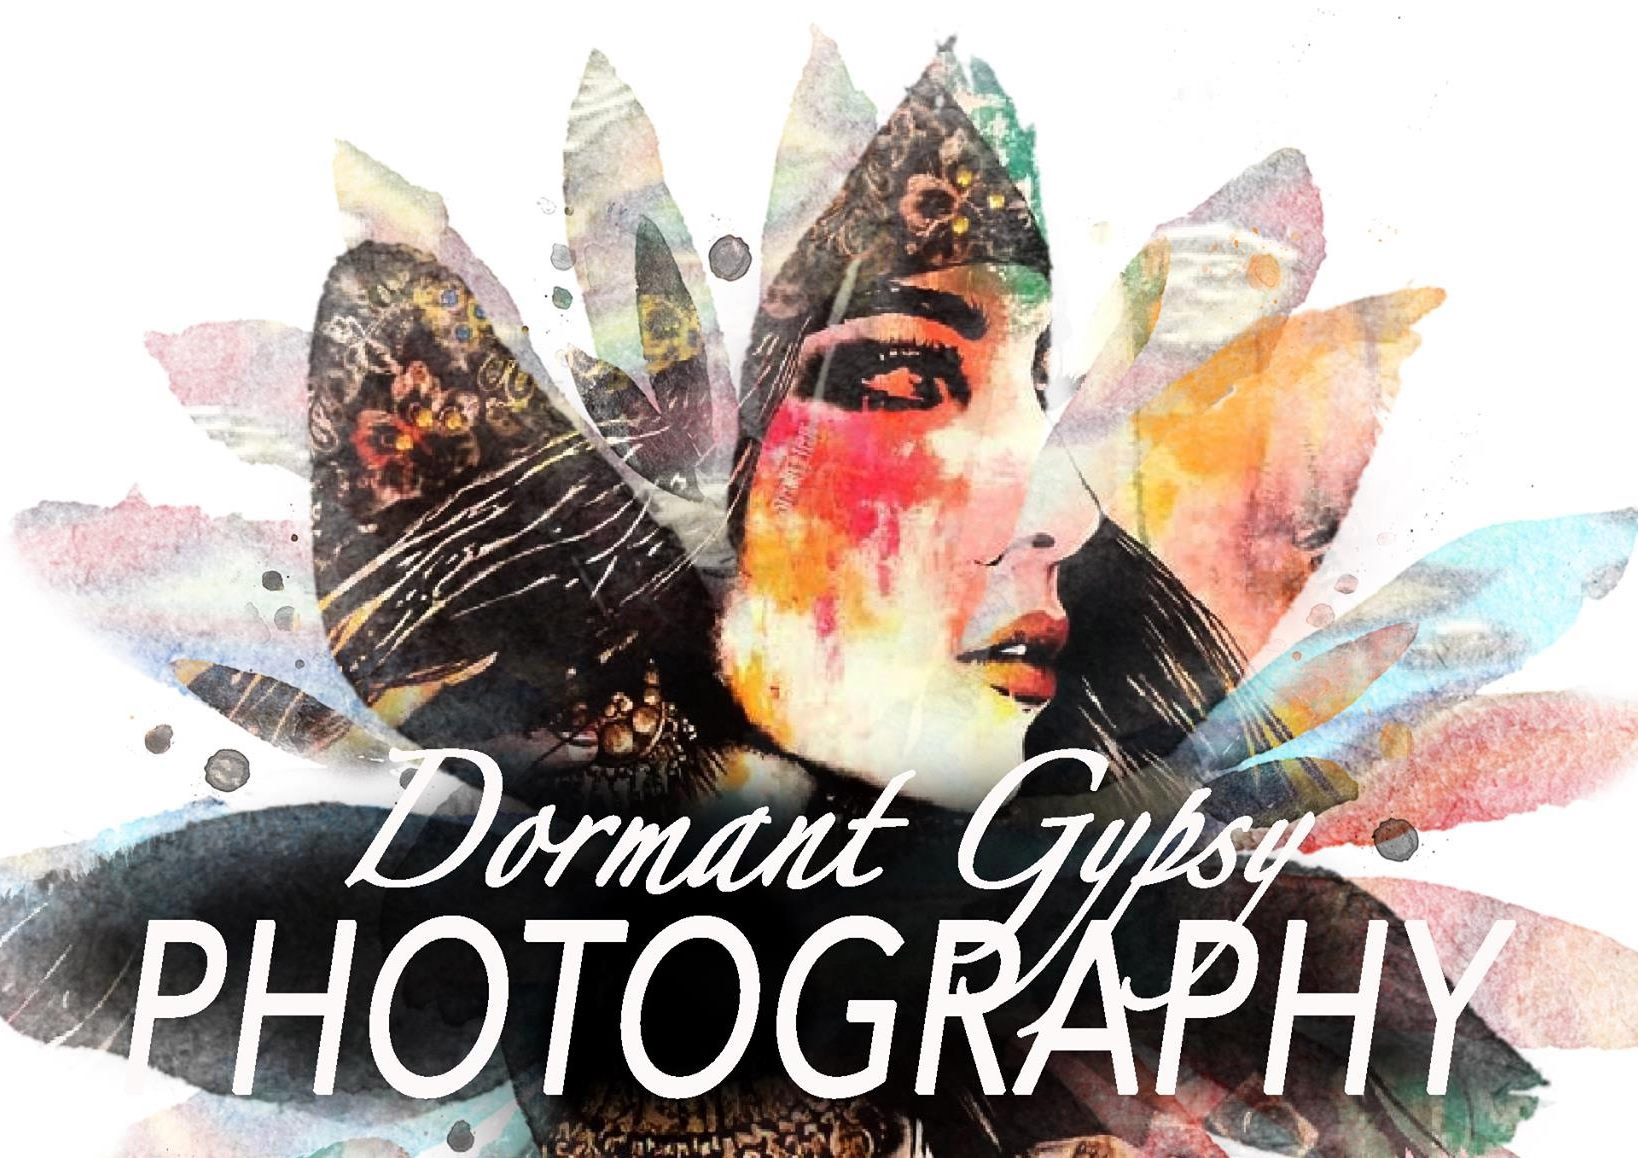 Dormant Gypsy Photography, LLC